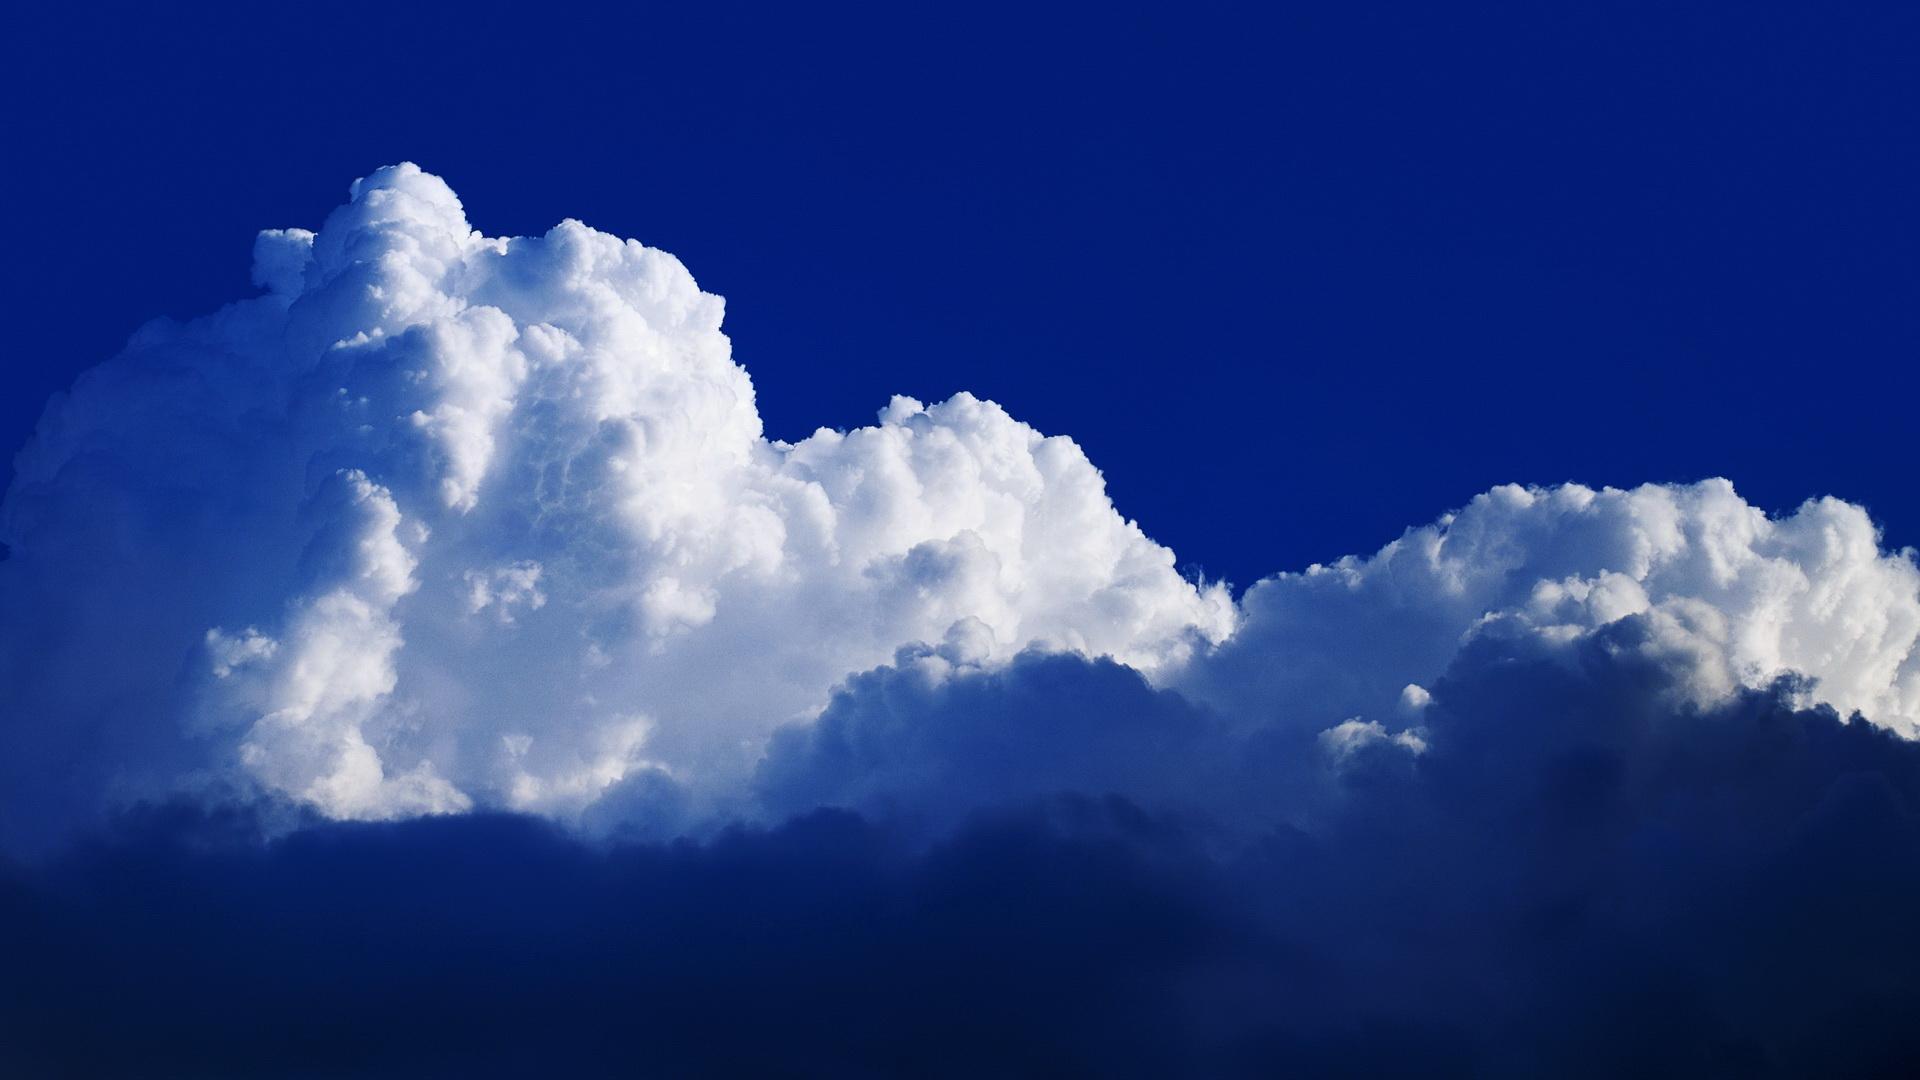 Cloud Computer Wallpapers Desktop Backgrounds 1920x1080 1920x1080